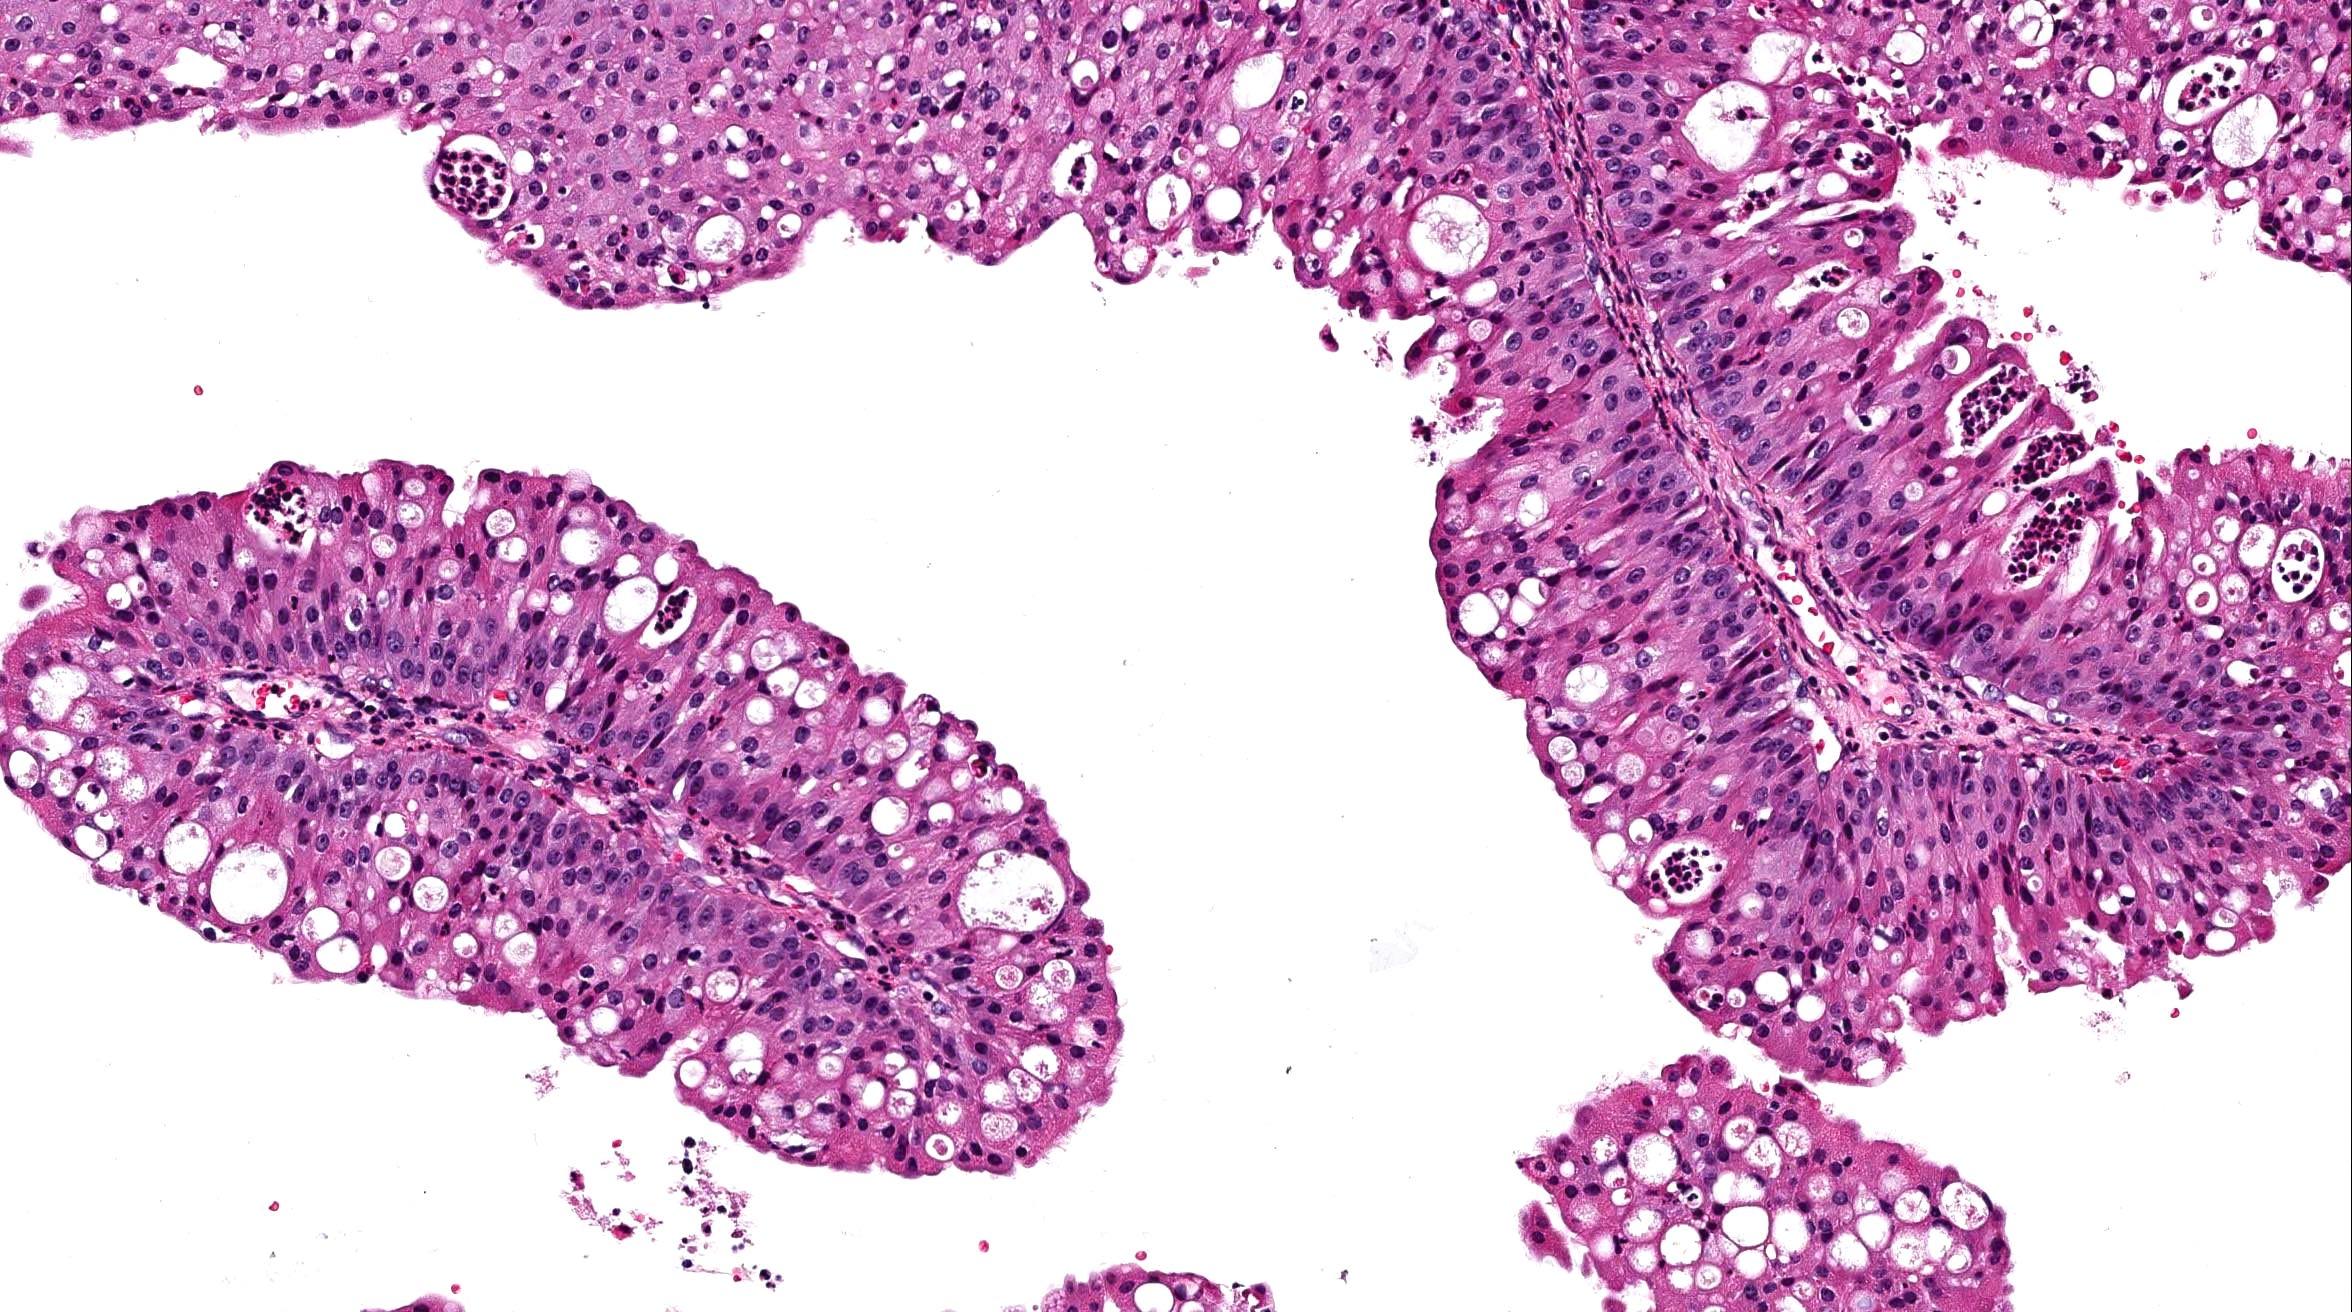 schneiderian papilloma immunohistochemistry